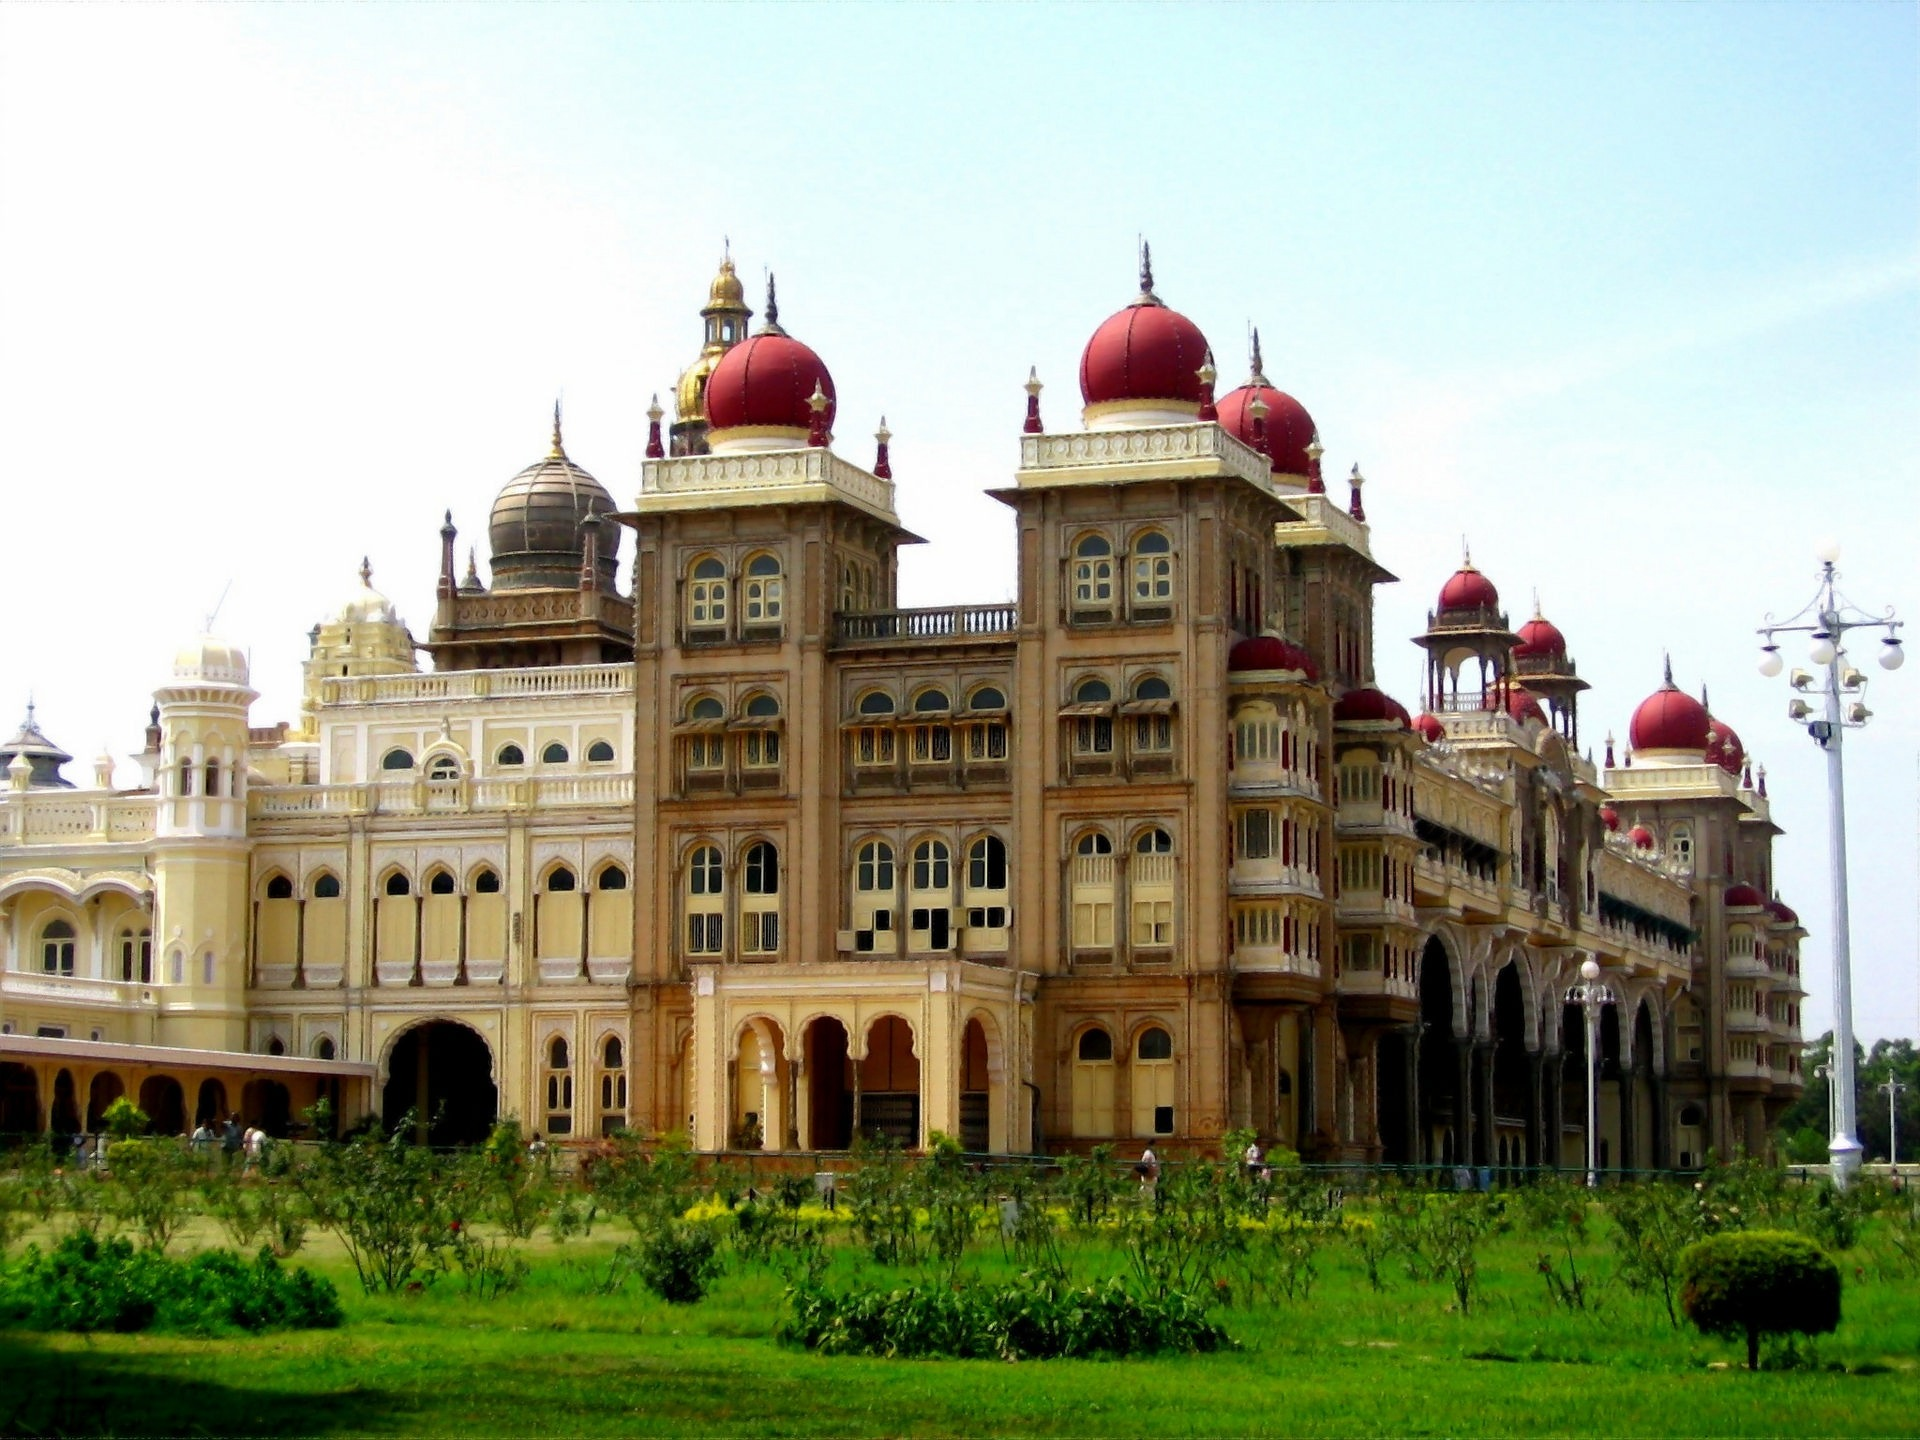 NOMAD-luksusowe-pociągi-Golden-Chariot-Indie-07-1